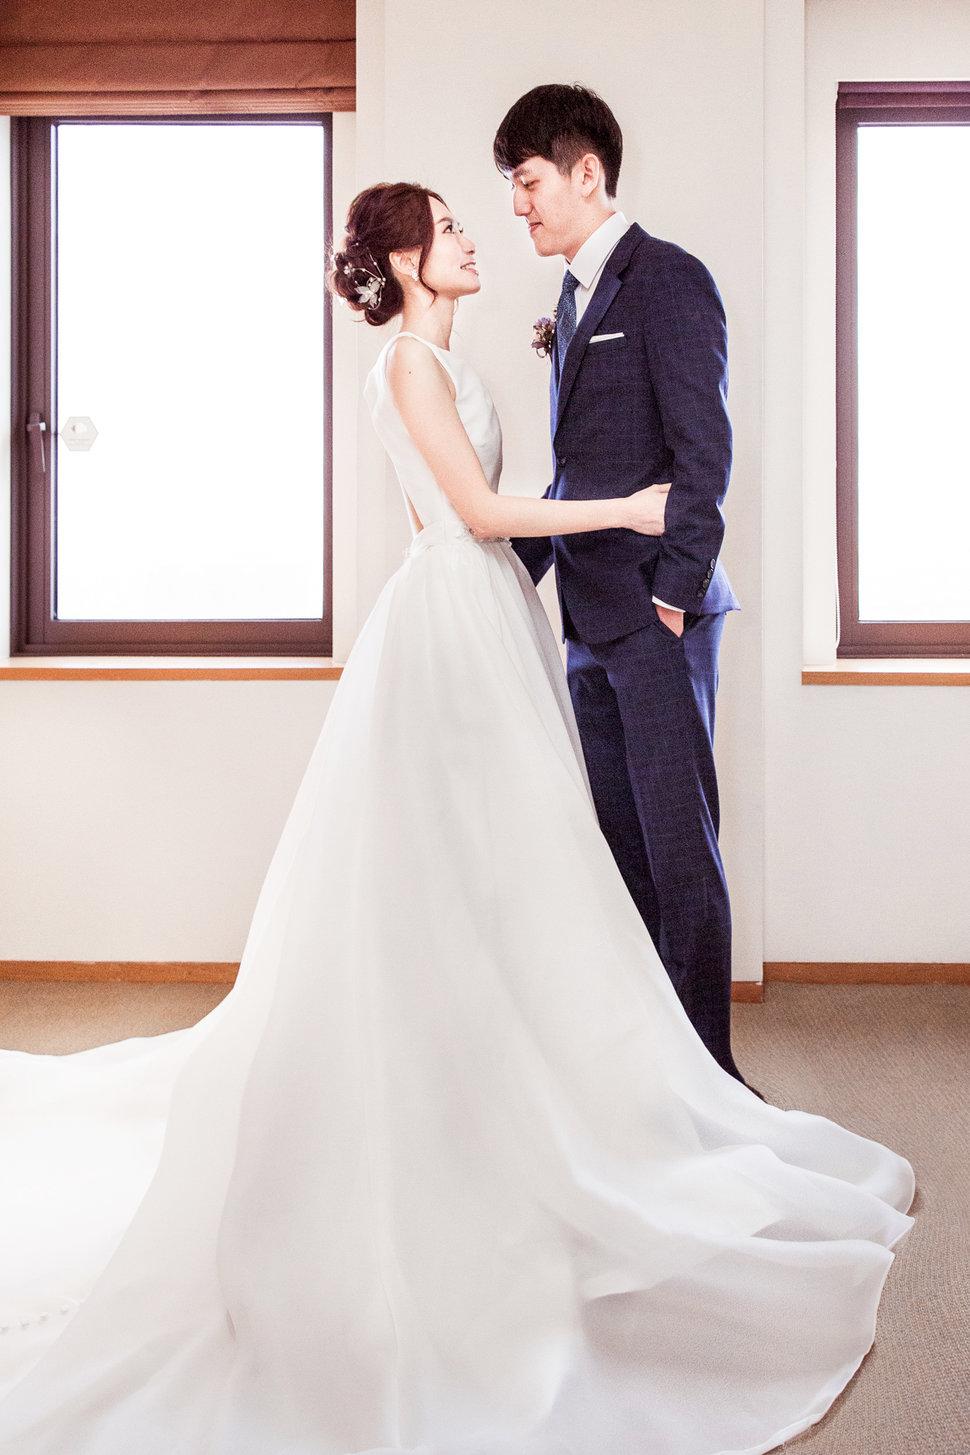 1H6A0412 - Inge Studio - 結婚吧